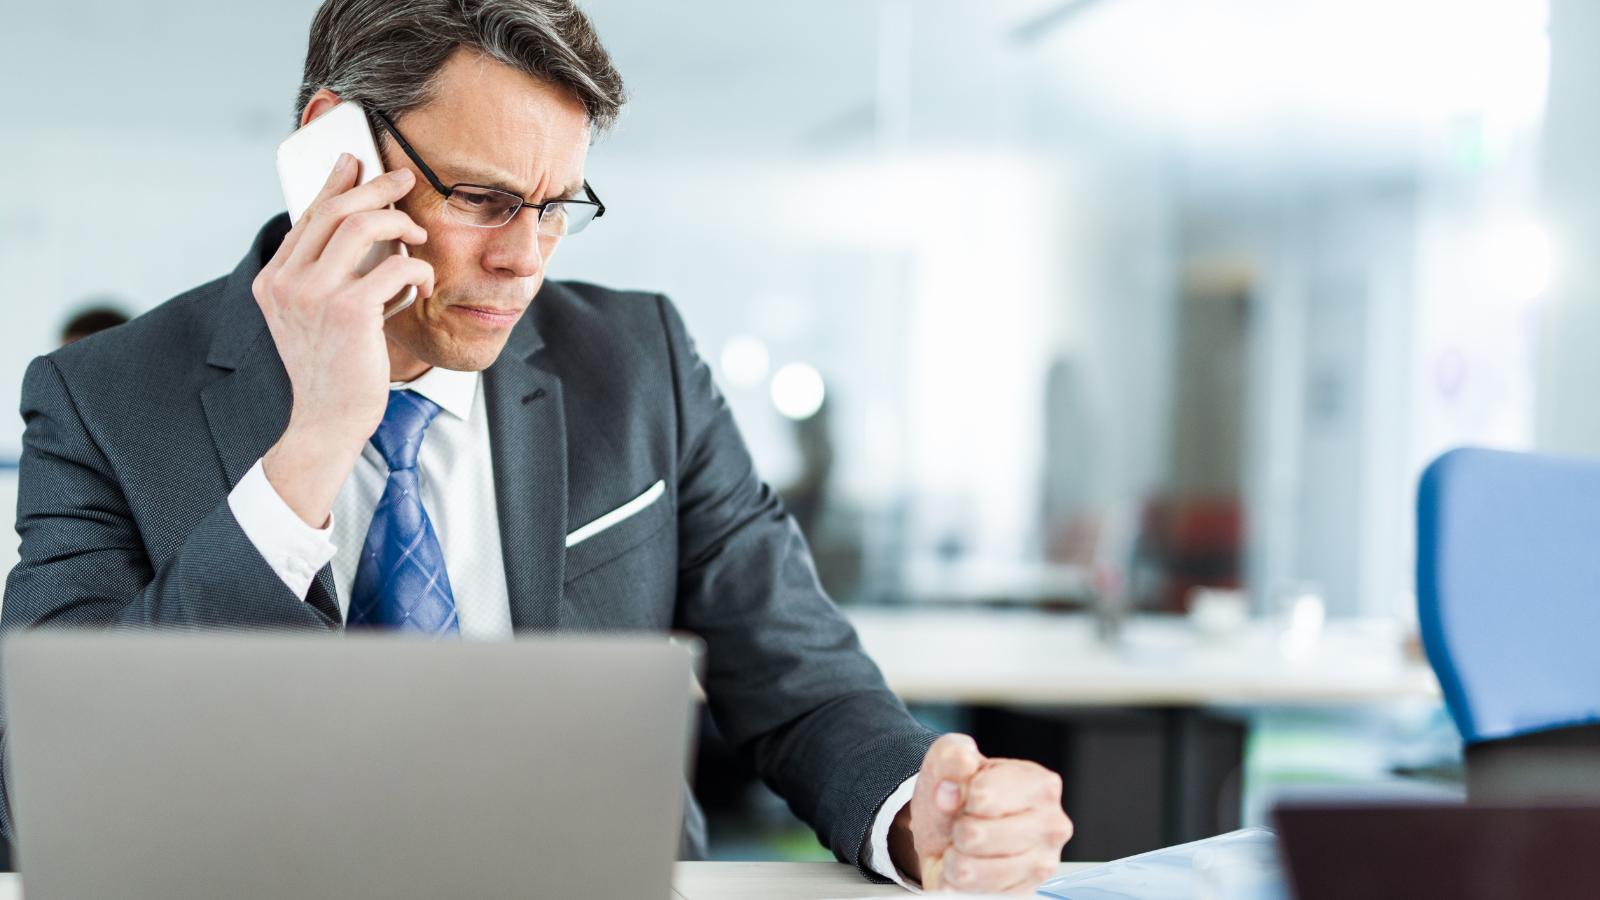 CRMs Cant Fix Underperforming Sales, Bombing Sales Calls